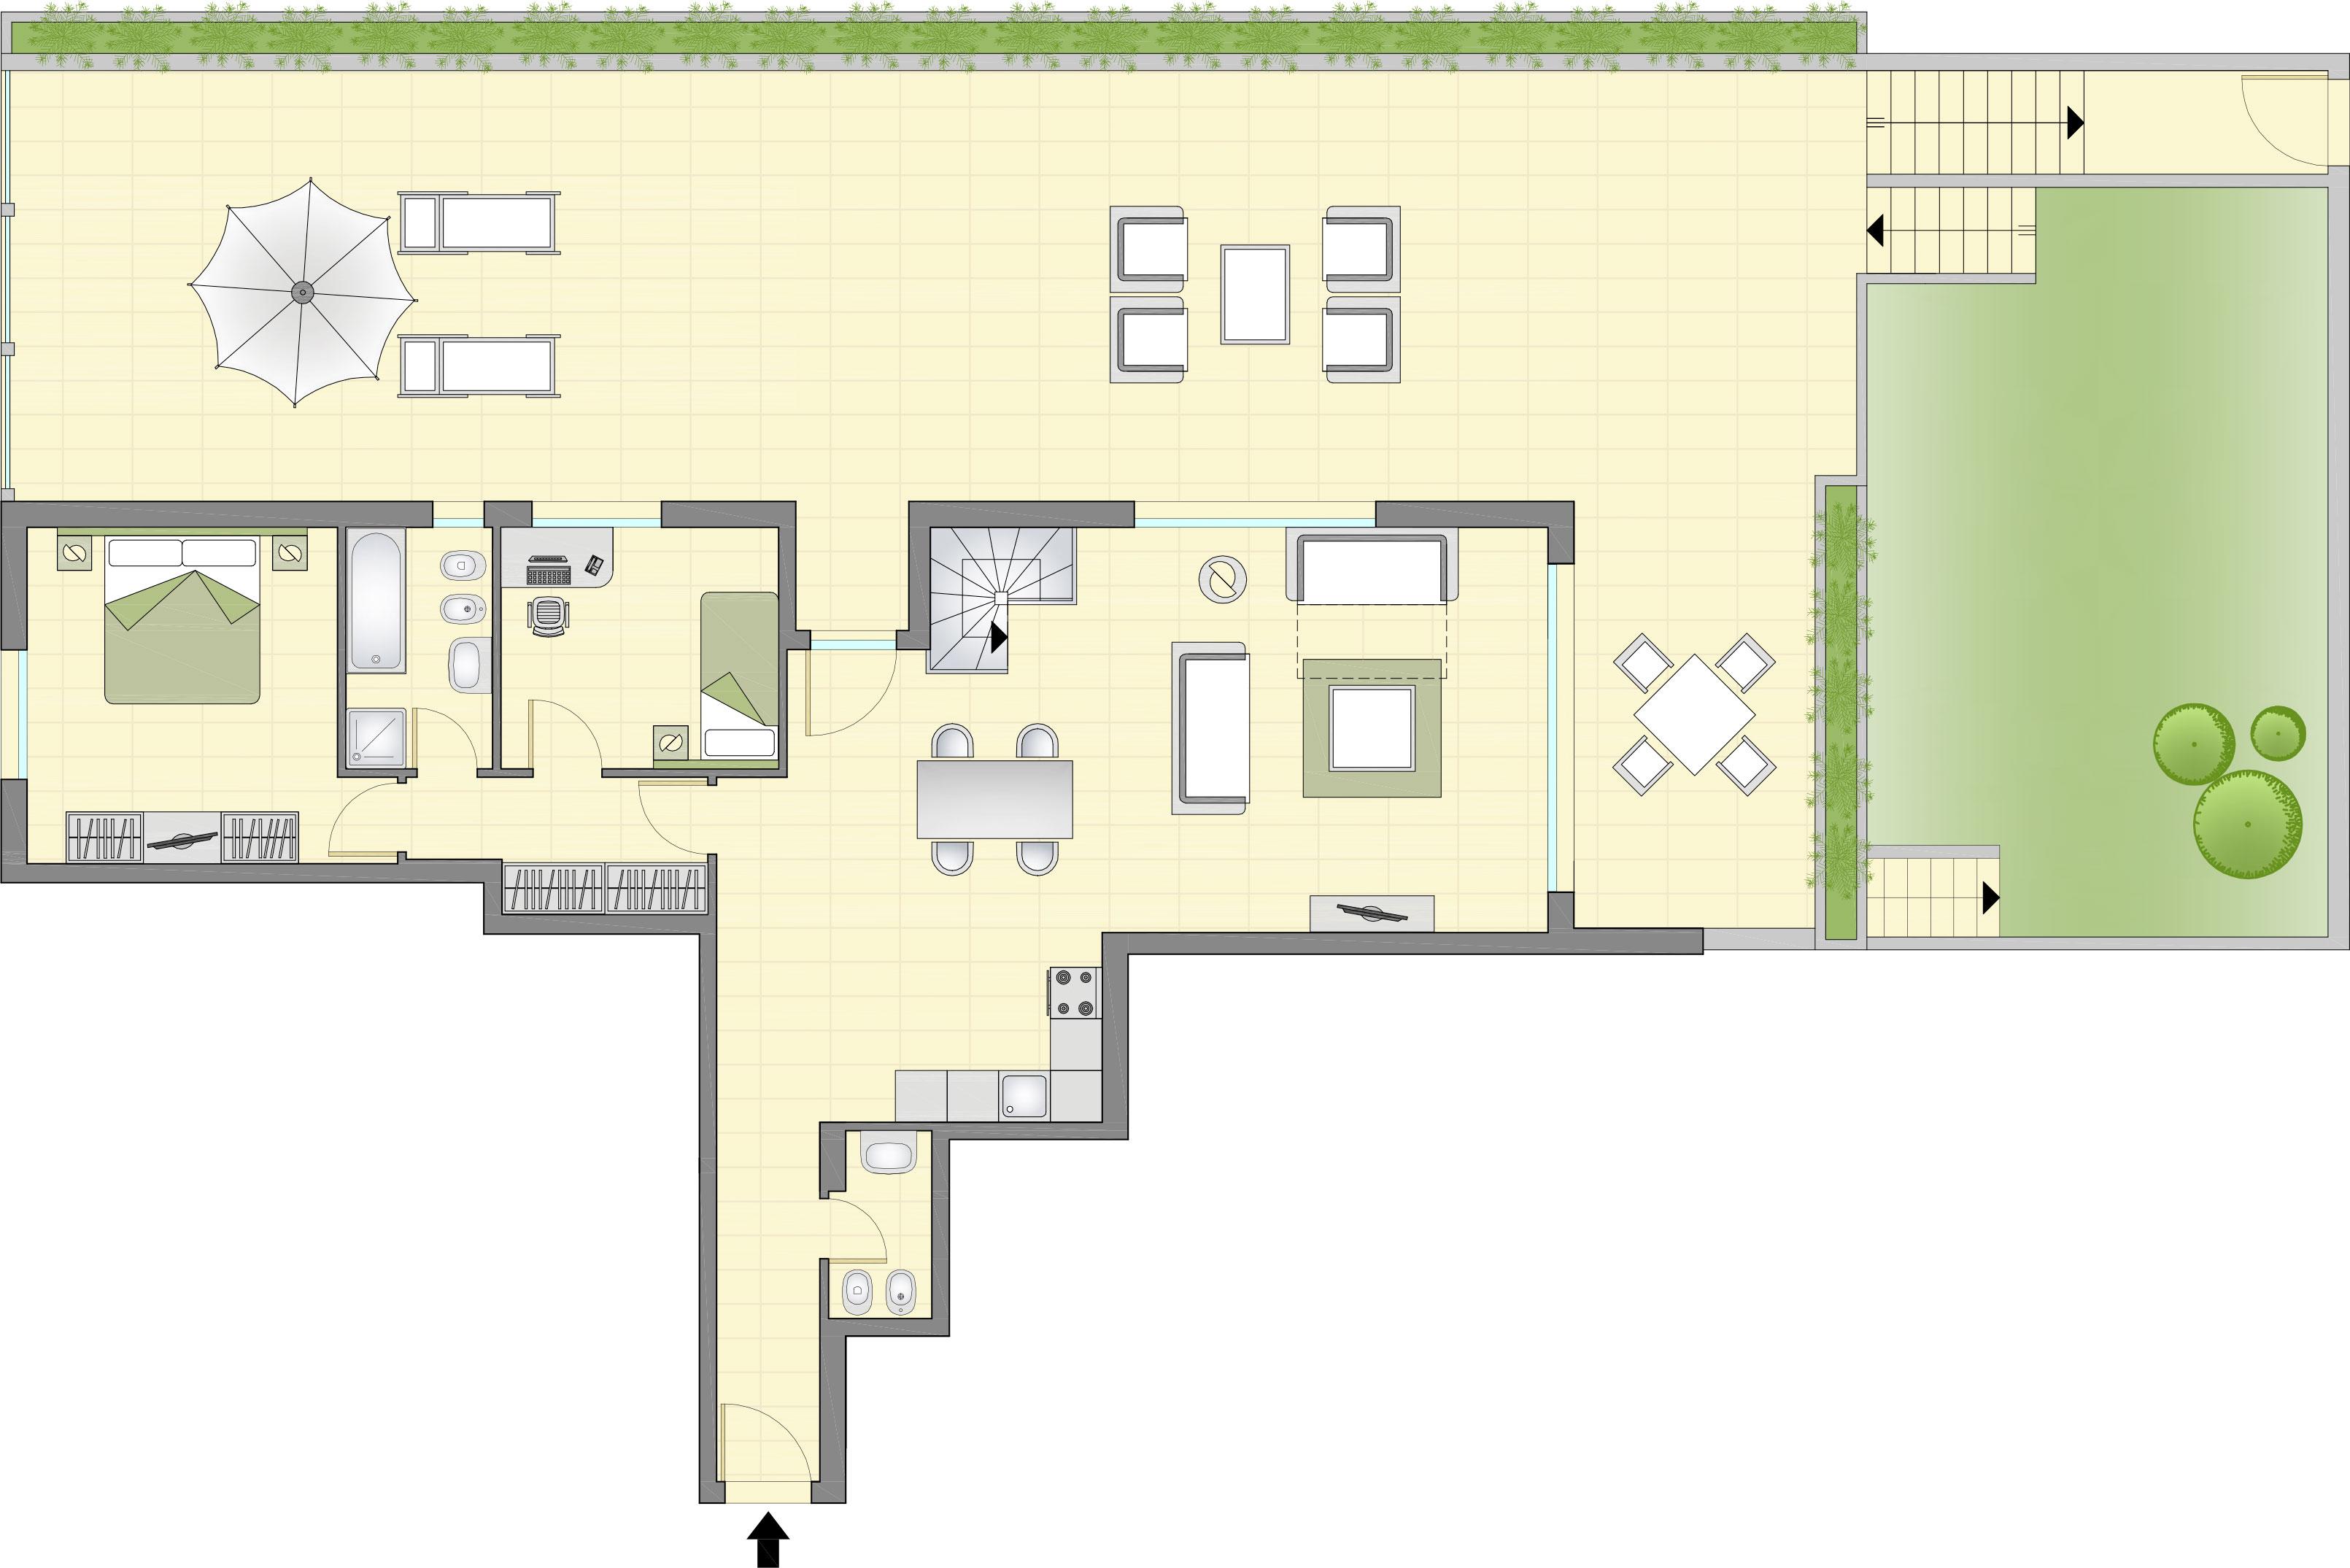 Planimetria appartamenti de luxe con giardino piano 1 for Planimetria giardino